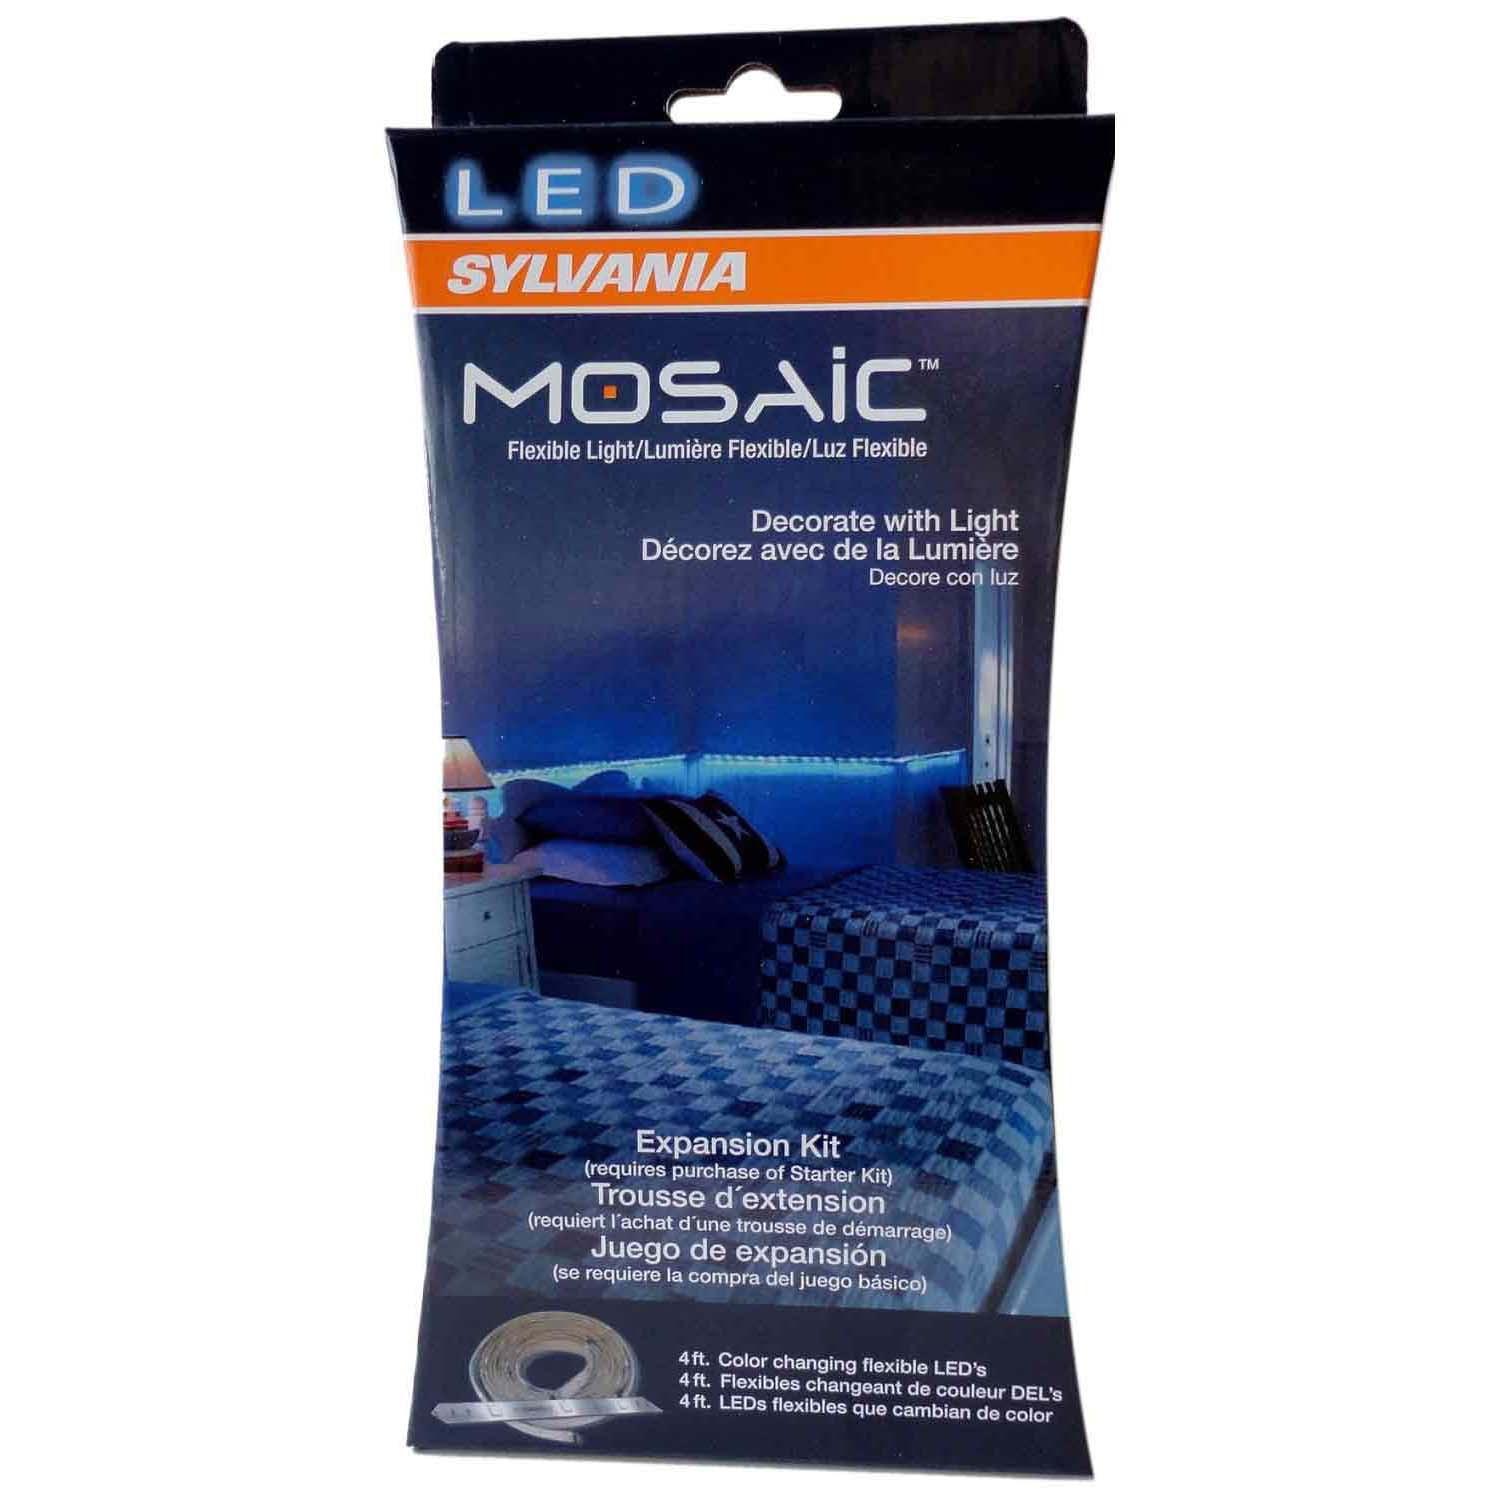 Sylvania Mosaic 2 Foot Led Rgbw Strip Lights Expansion Kit